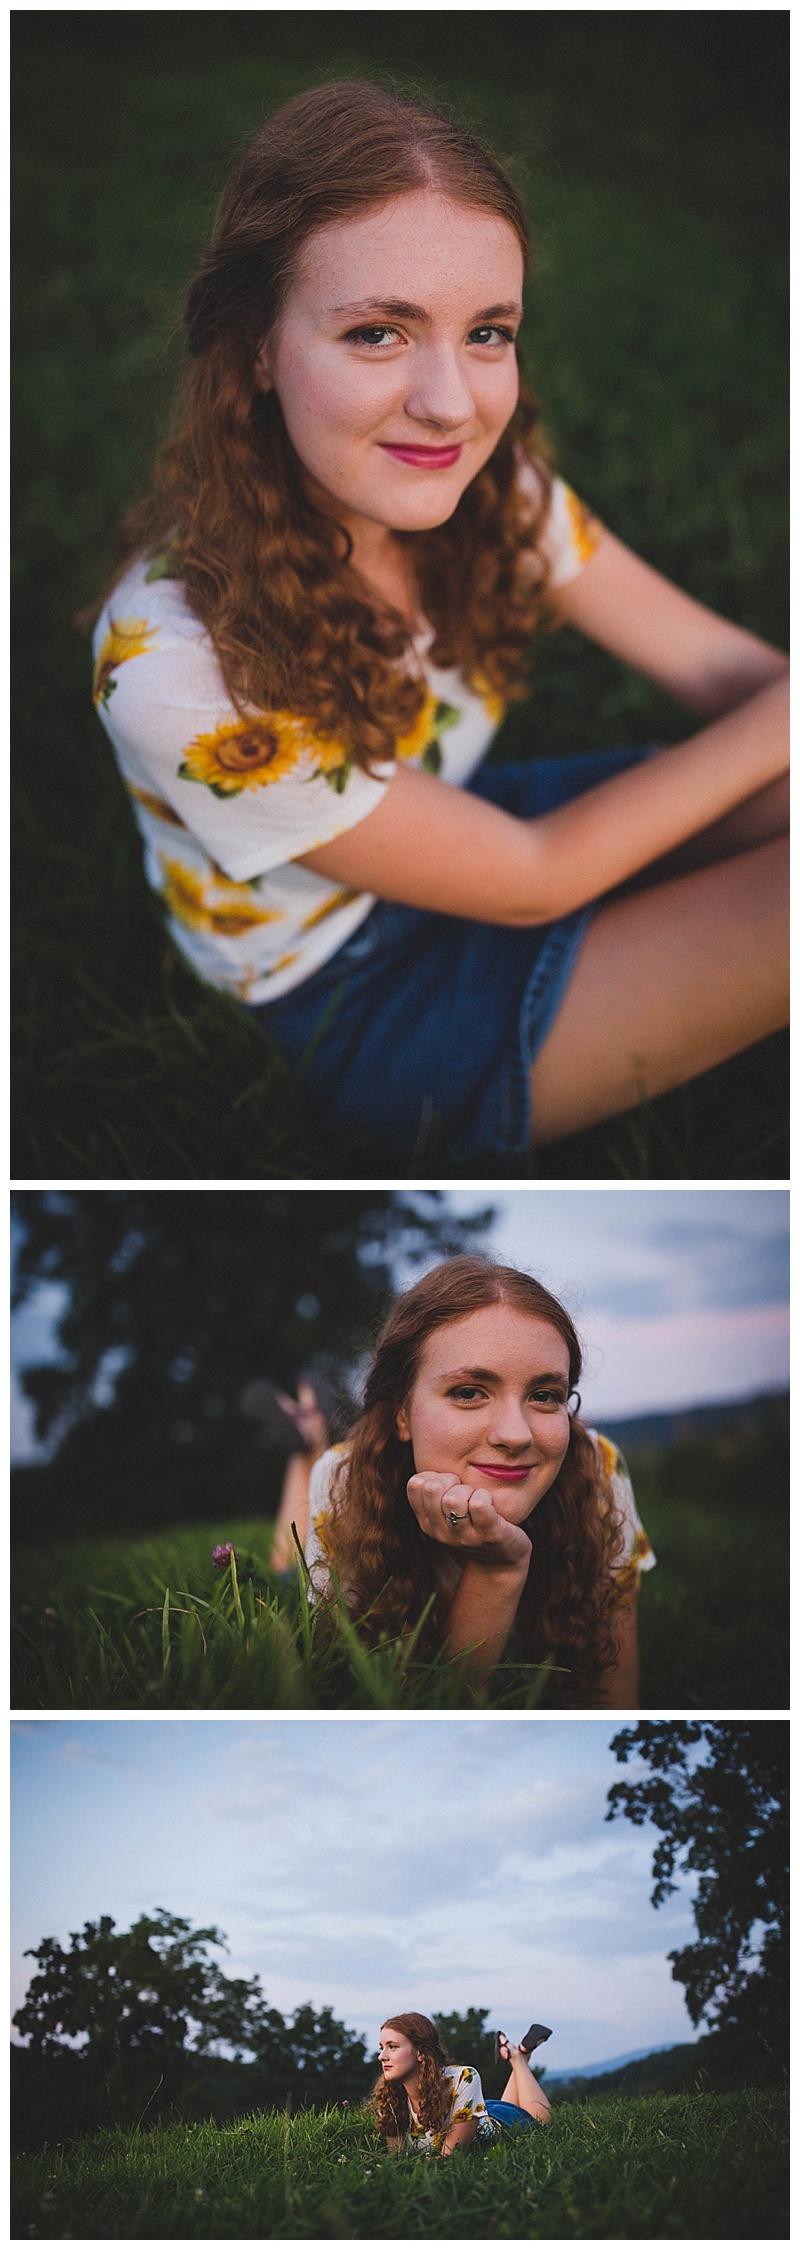 EmilyRogers_southwest-va-wedding-photographer-lebanon-virginia-senior-photographer_0011.jpg